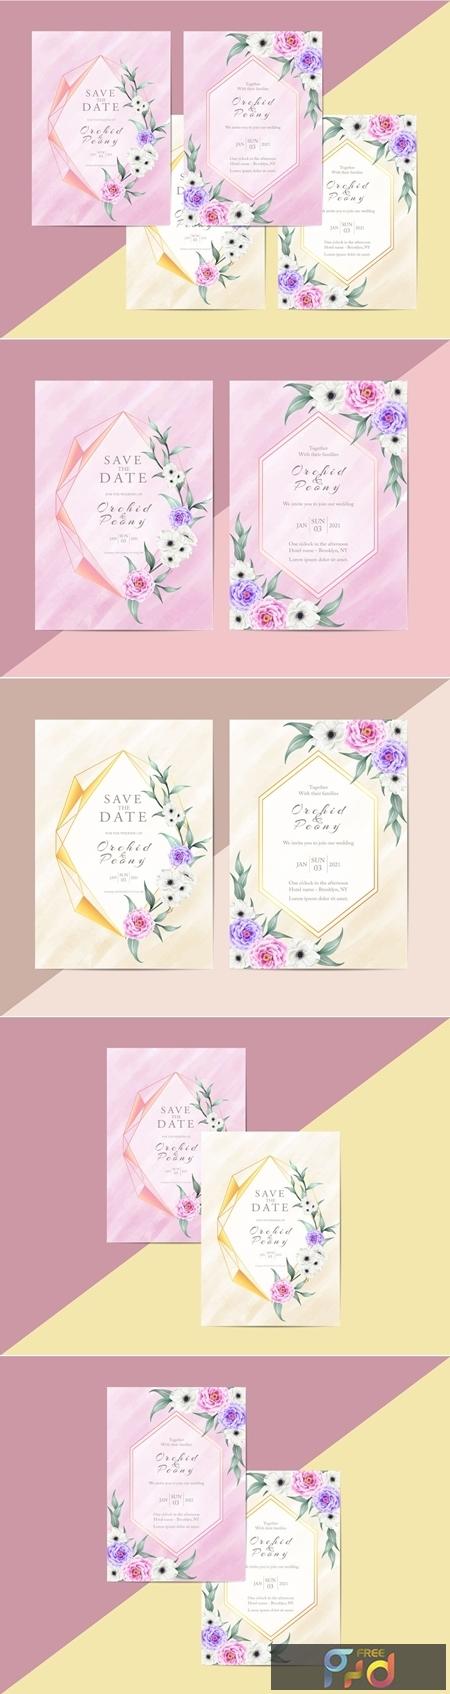 Elegant Floral Wedding Invitation Card Template Modern Style 1